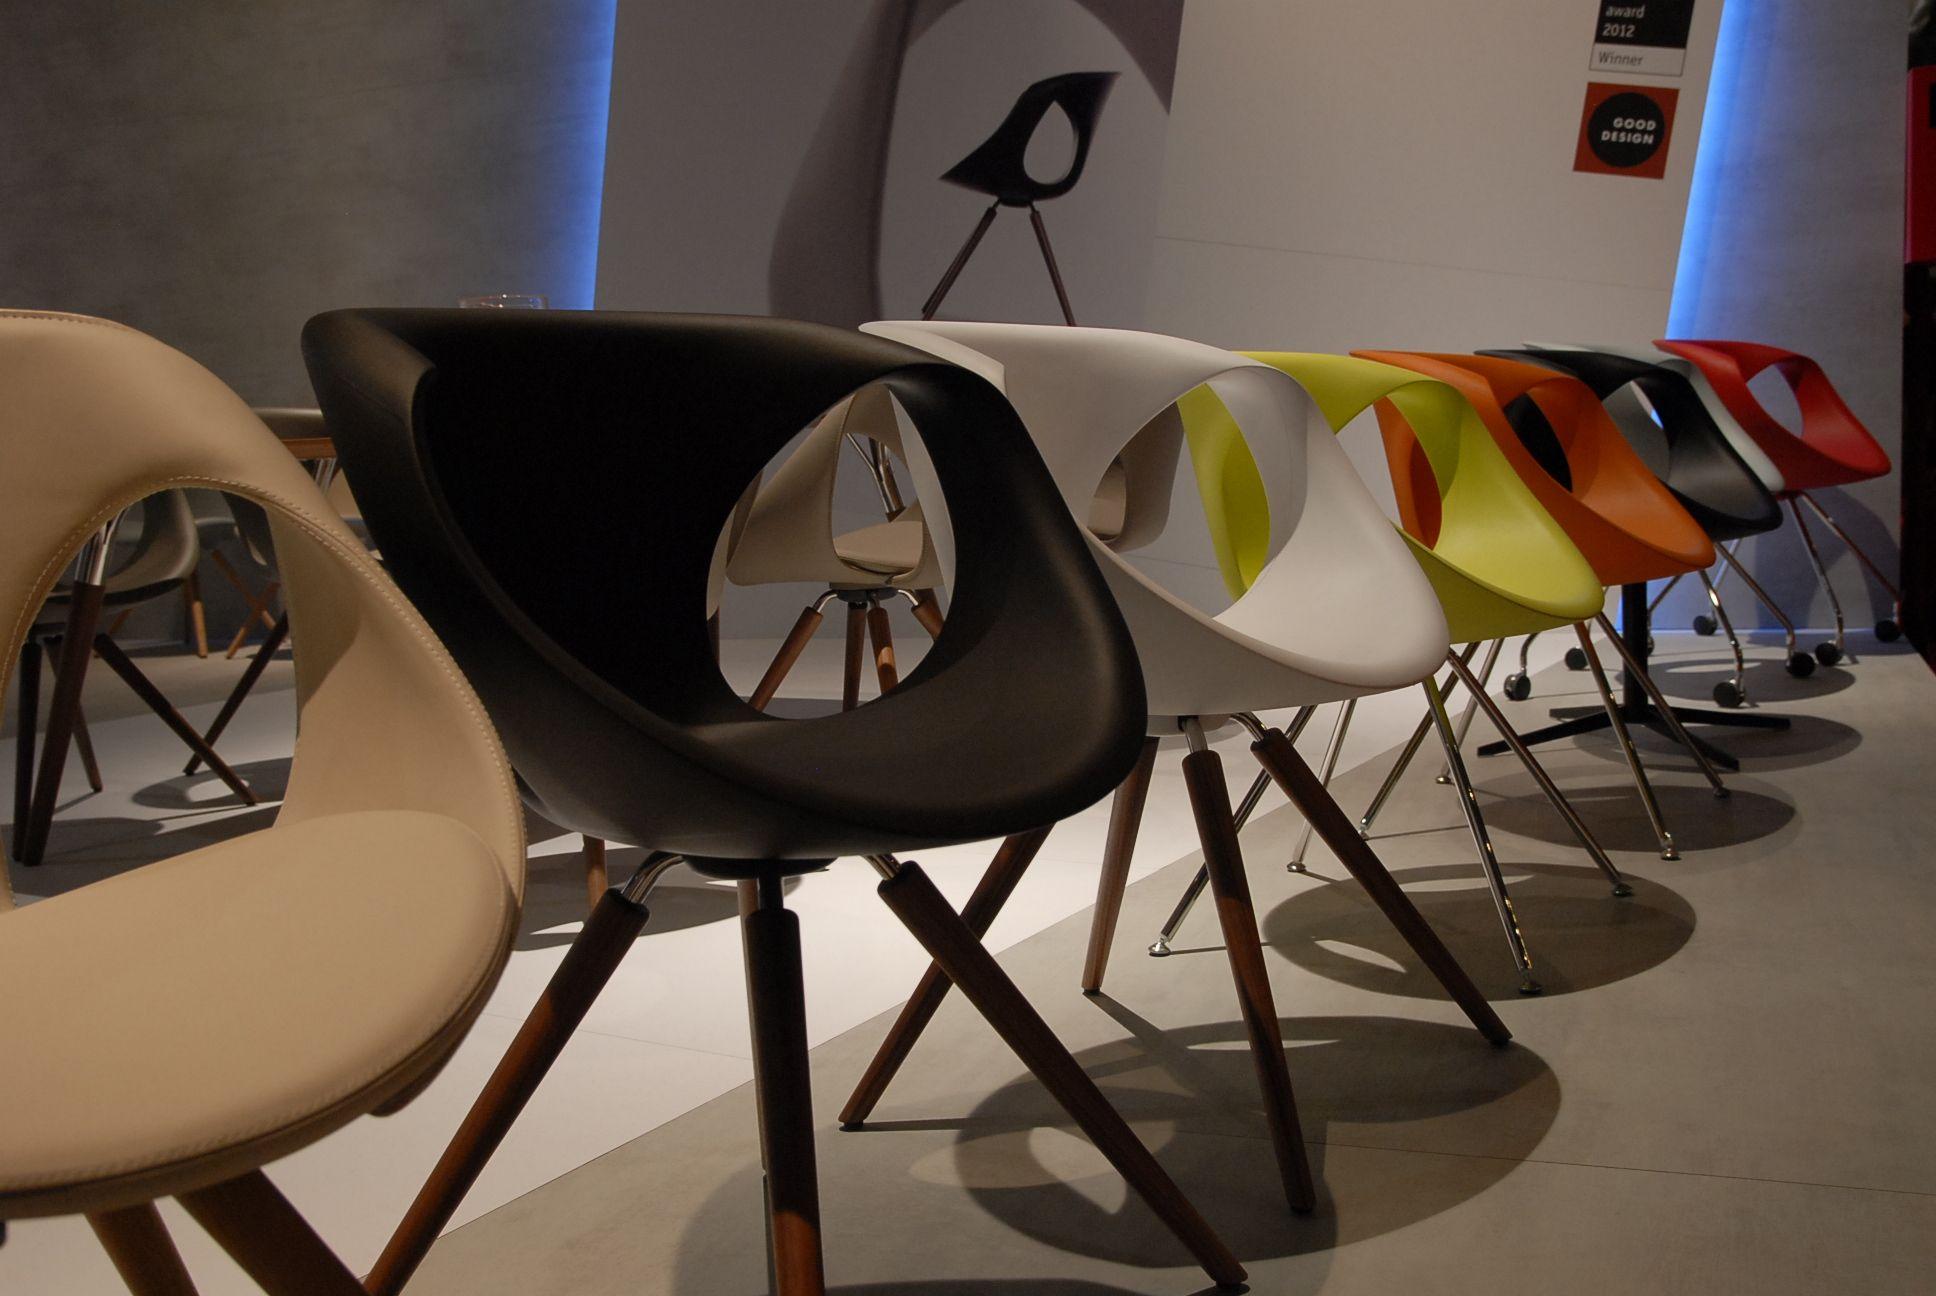 Farsi avvolgere da una sedia. #interiordesign #sedia #chair #relax #livingroom #seat #lounge